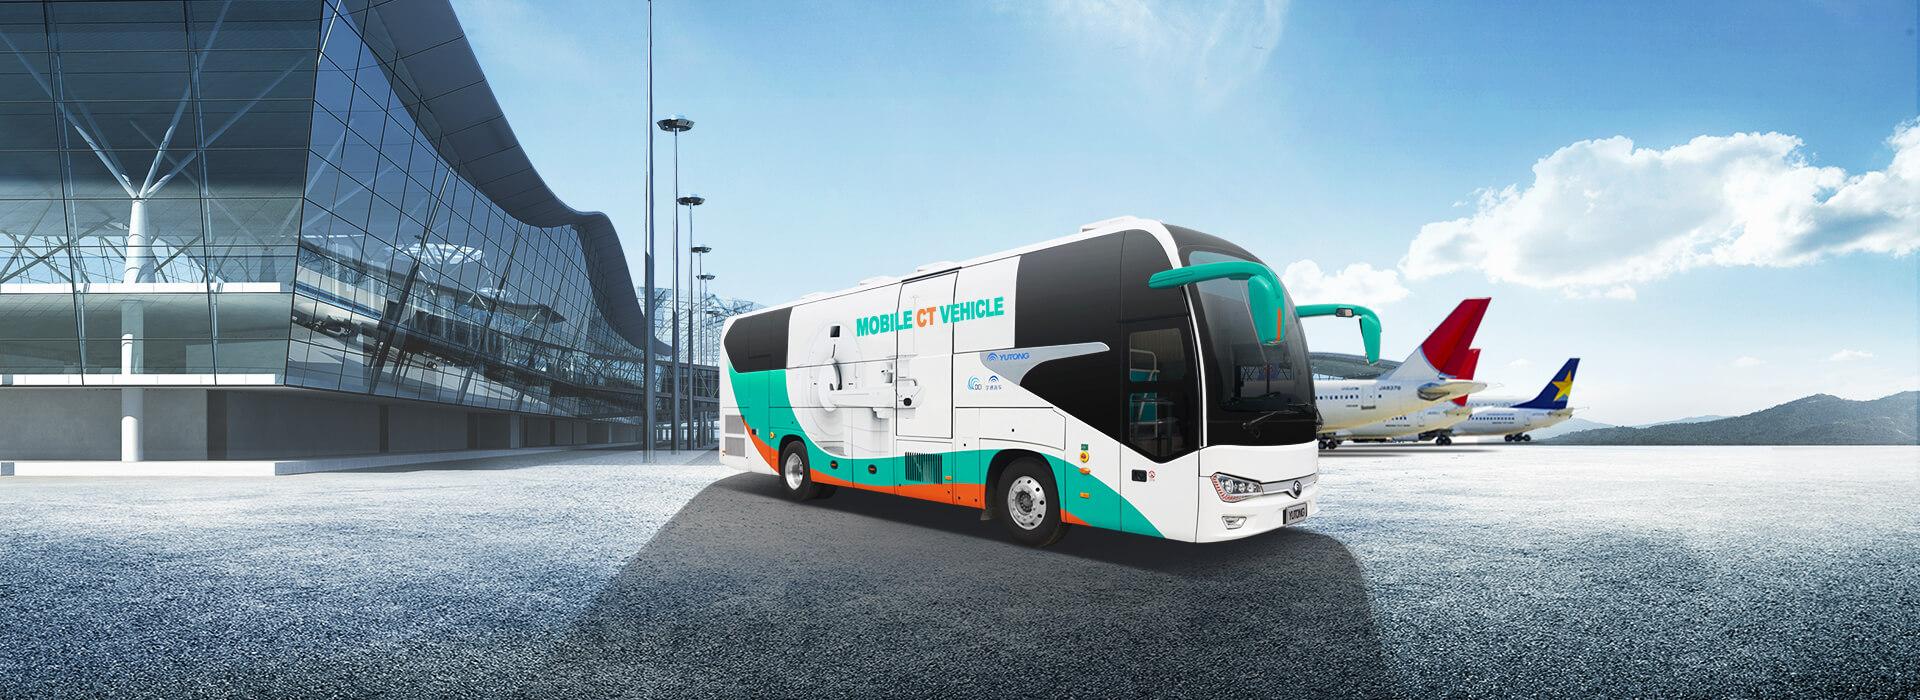 Mobile CT Vehicle